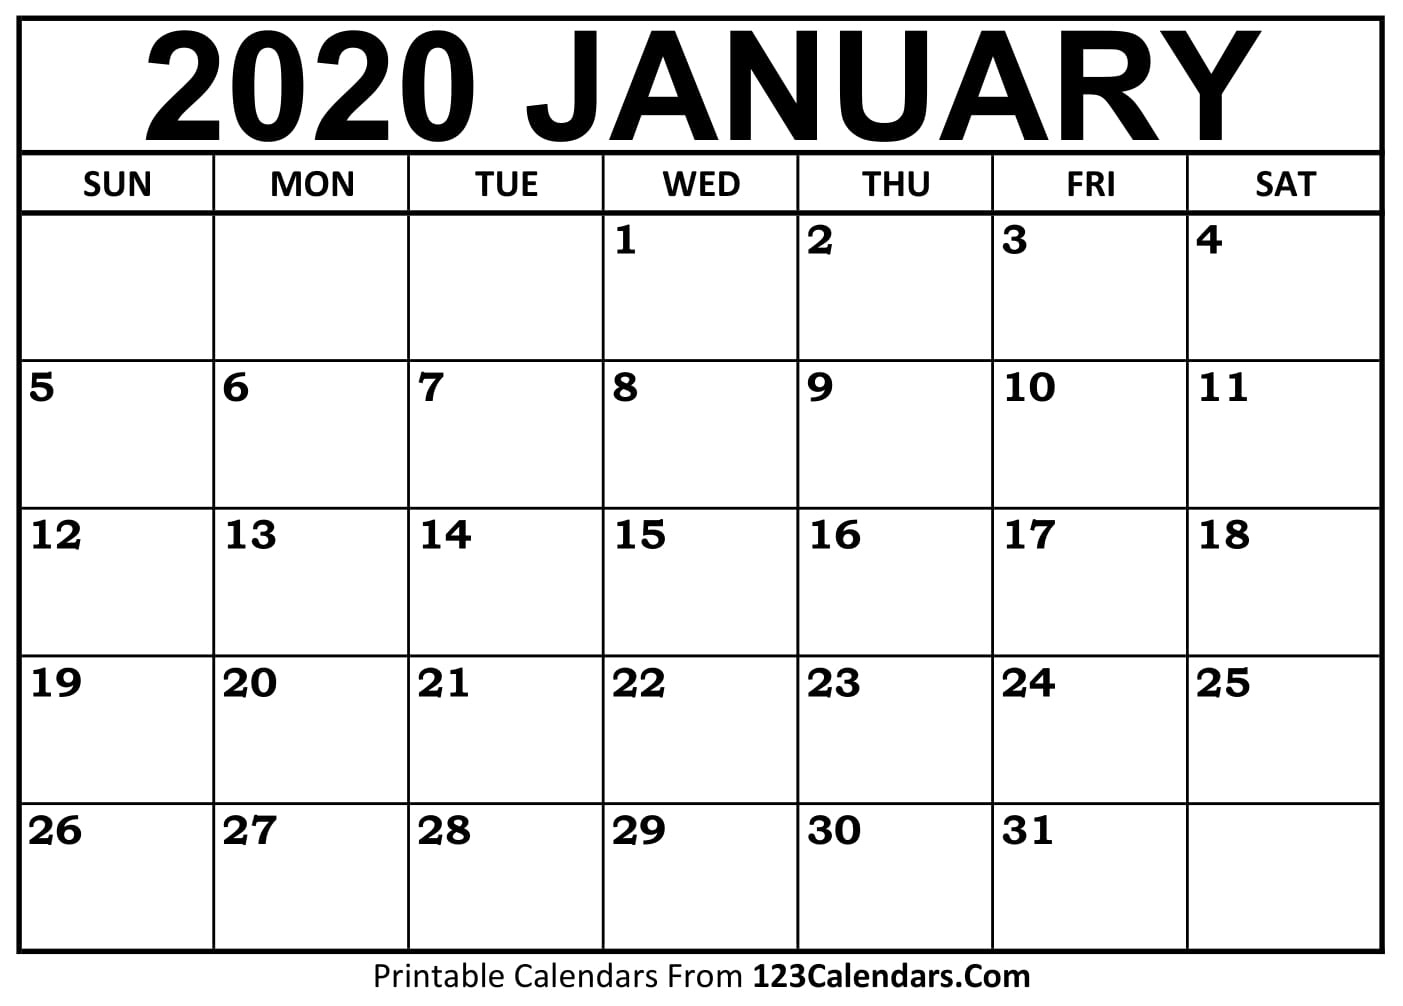 January 2020 Printable Calendar | 123Calendars Perky 2020 Monthly Calendar Template Word